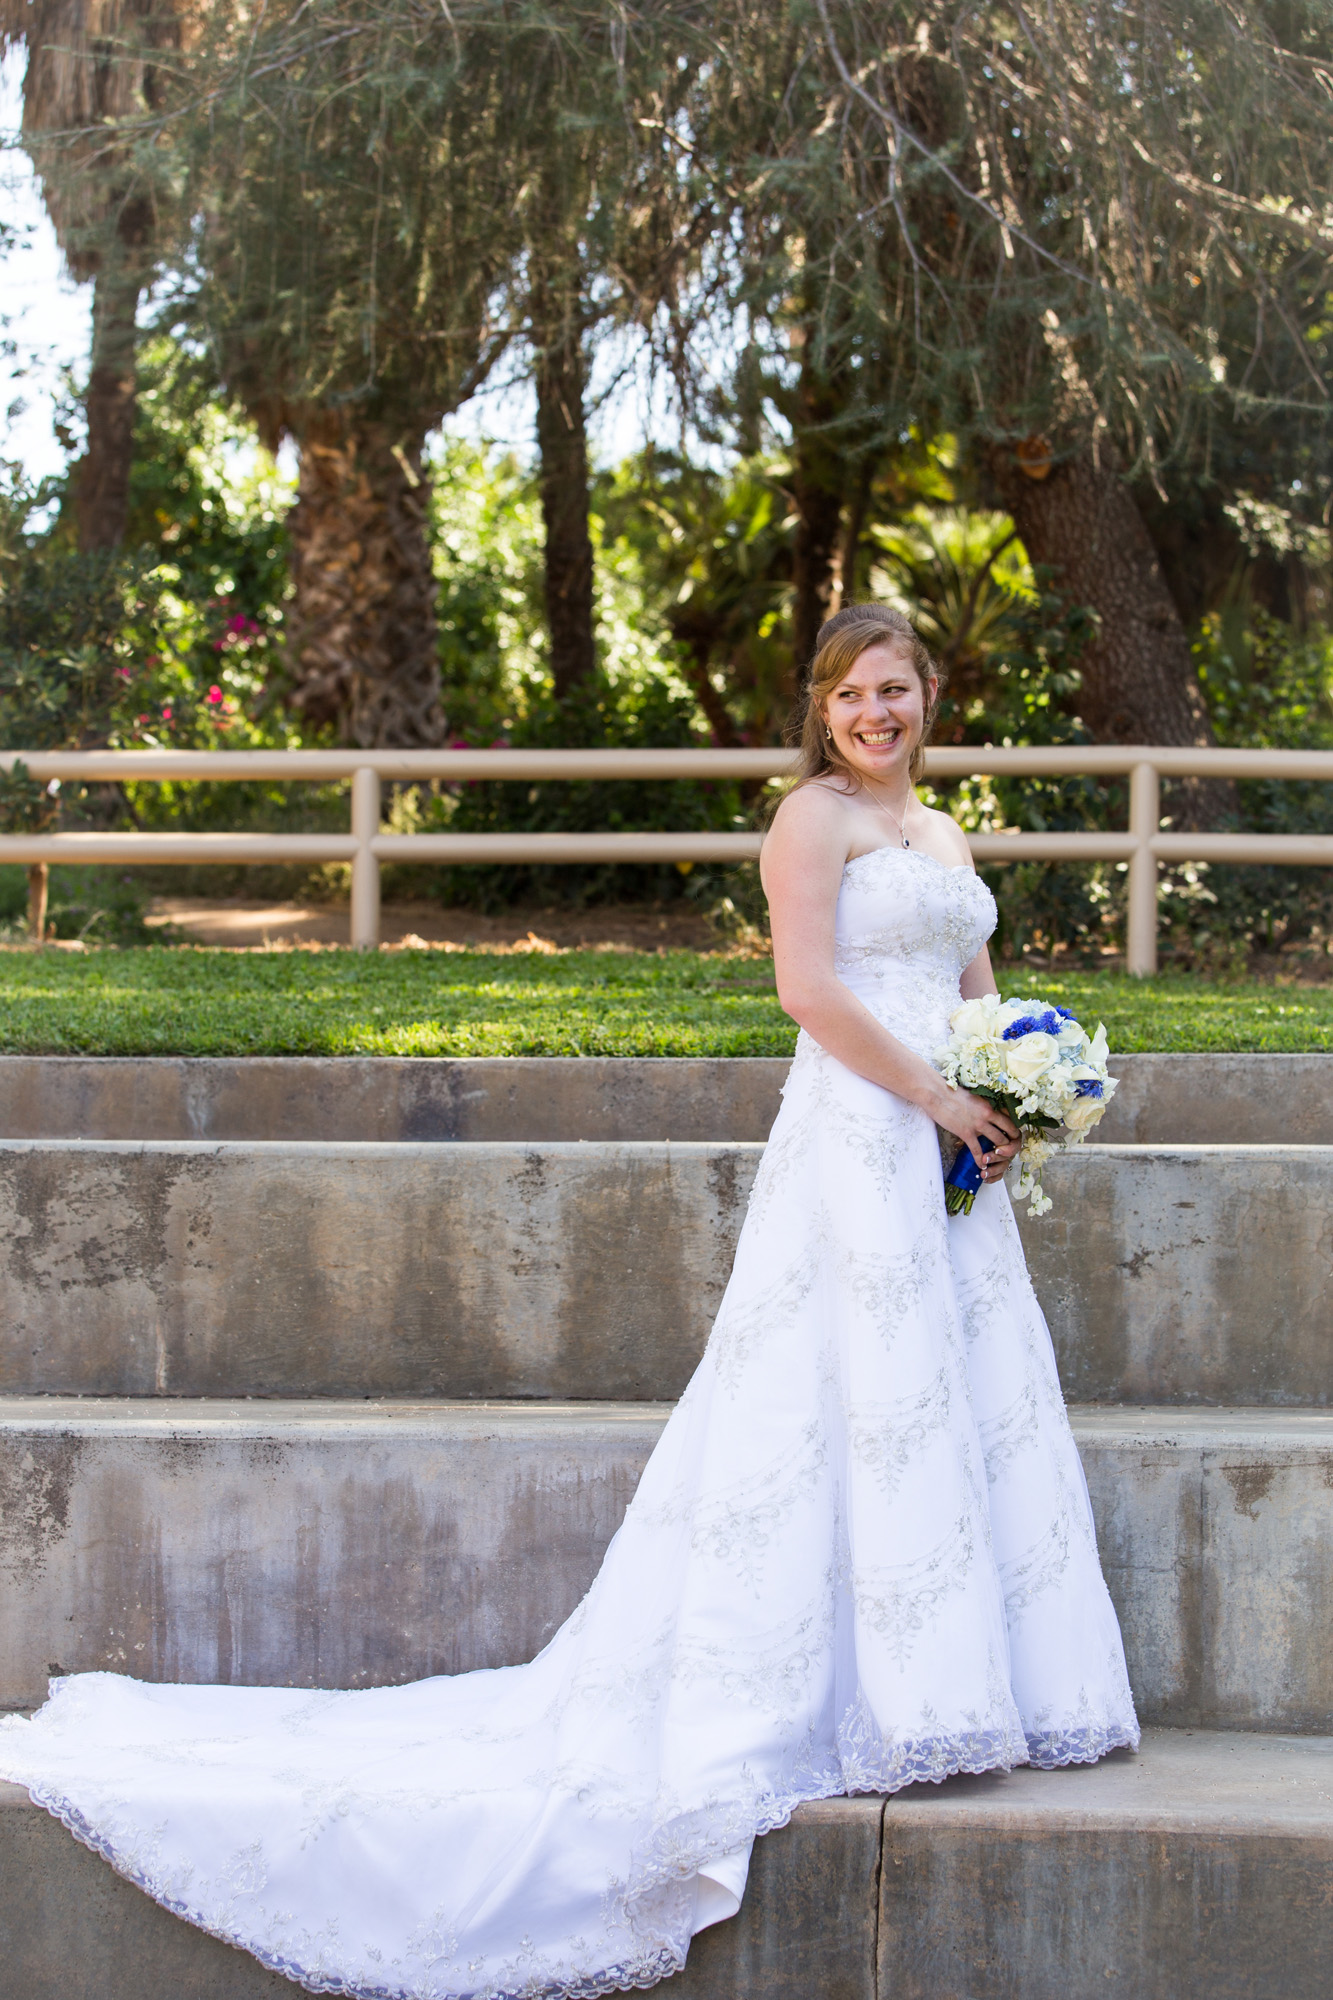 classic wedding dress bride portrait